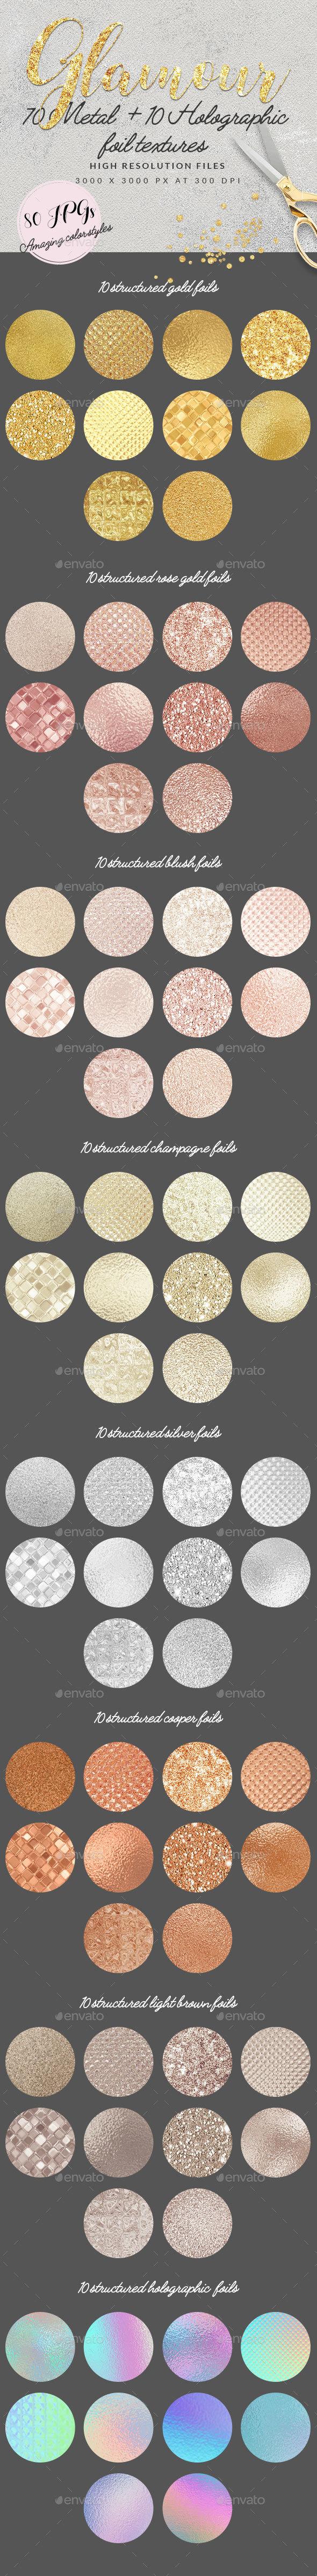 Metal & Holographic Foil Textures - Textures